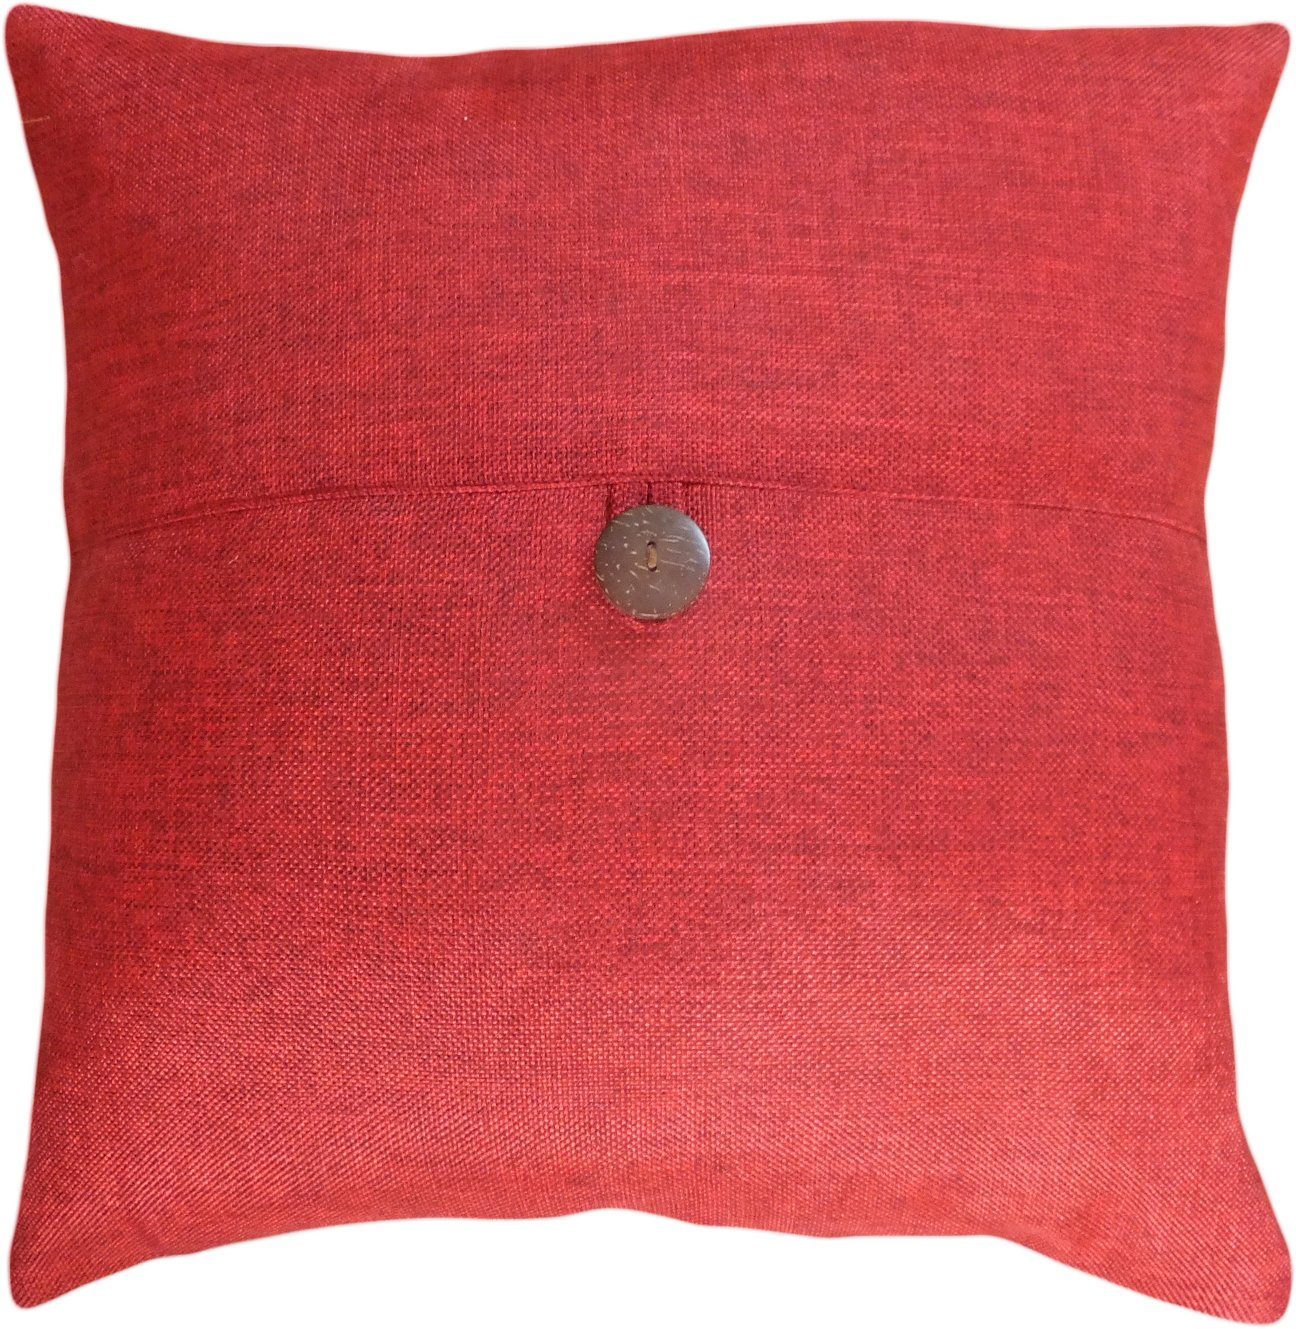 Amazon.com: Decorative Button Burgundy Throw Pillow Cover 16 ...